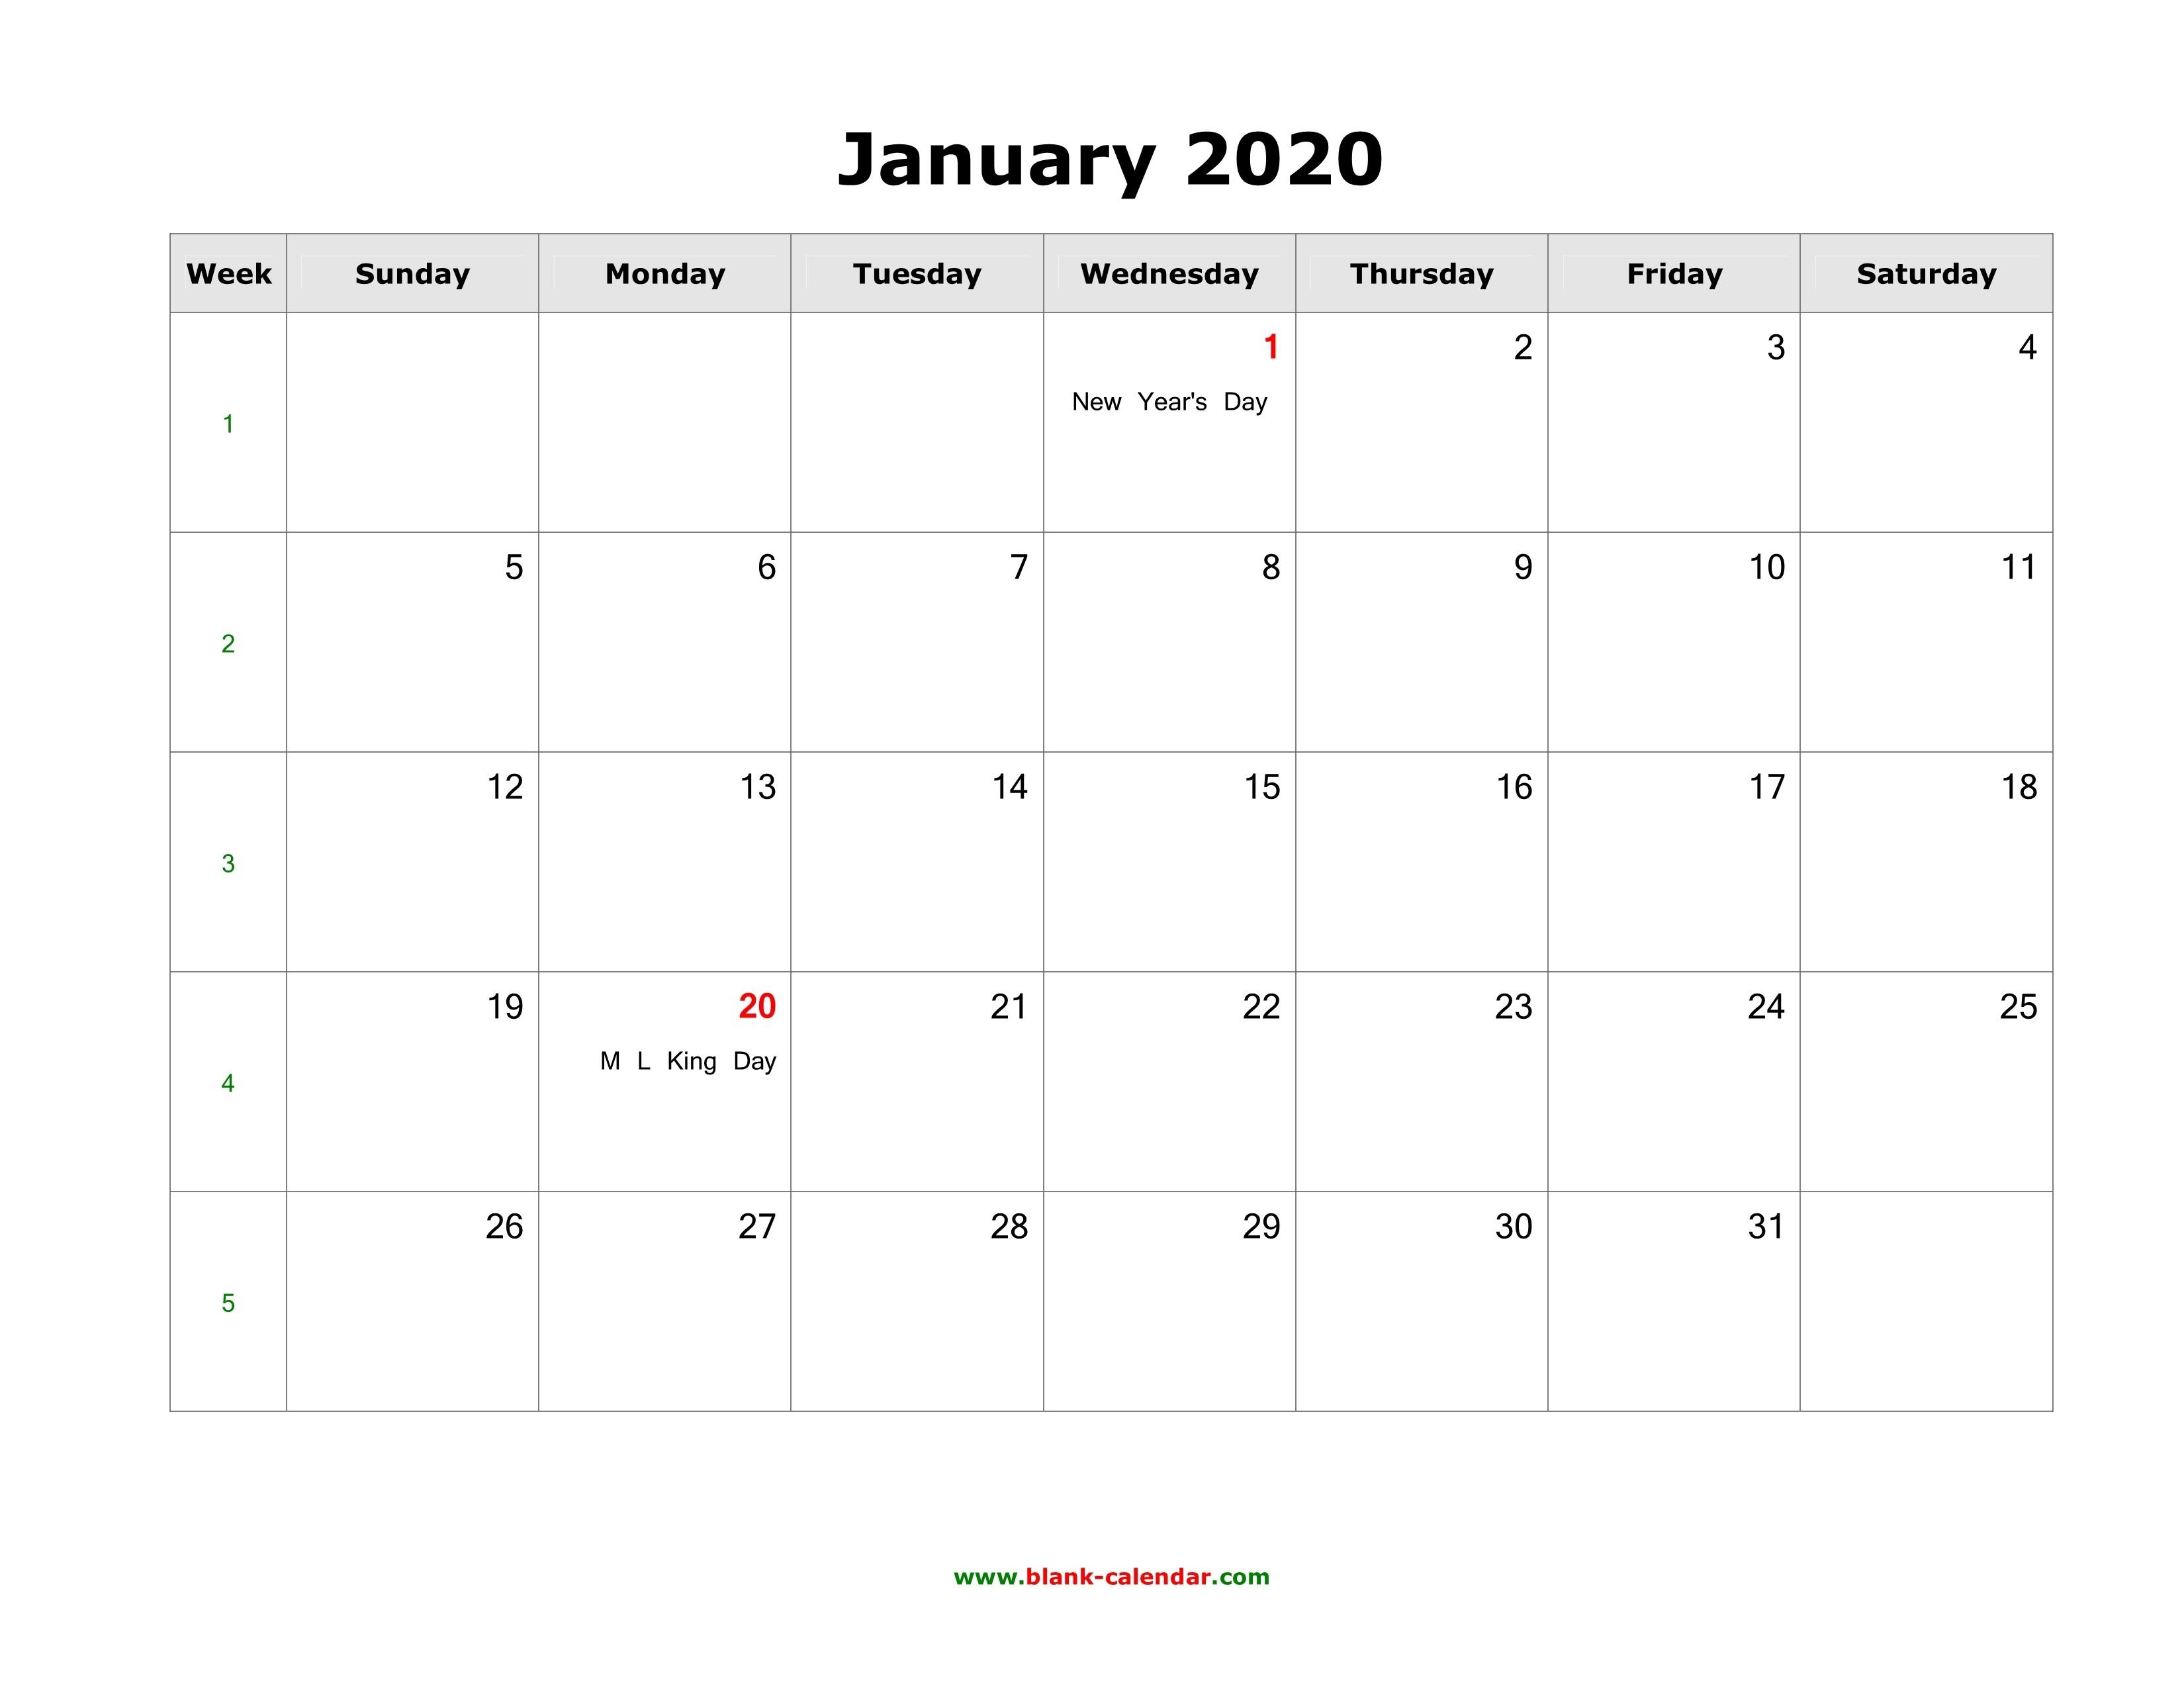 January 2020 Blank Calendar | Free Download Calendar Templates-Fillable January 2020 Calendar